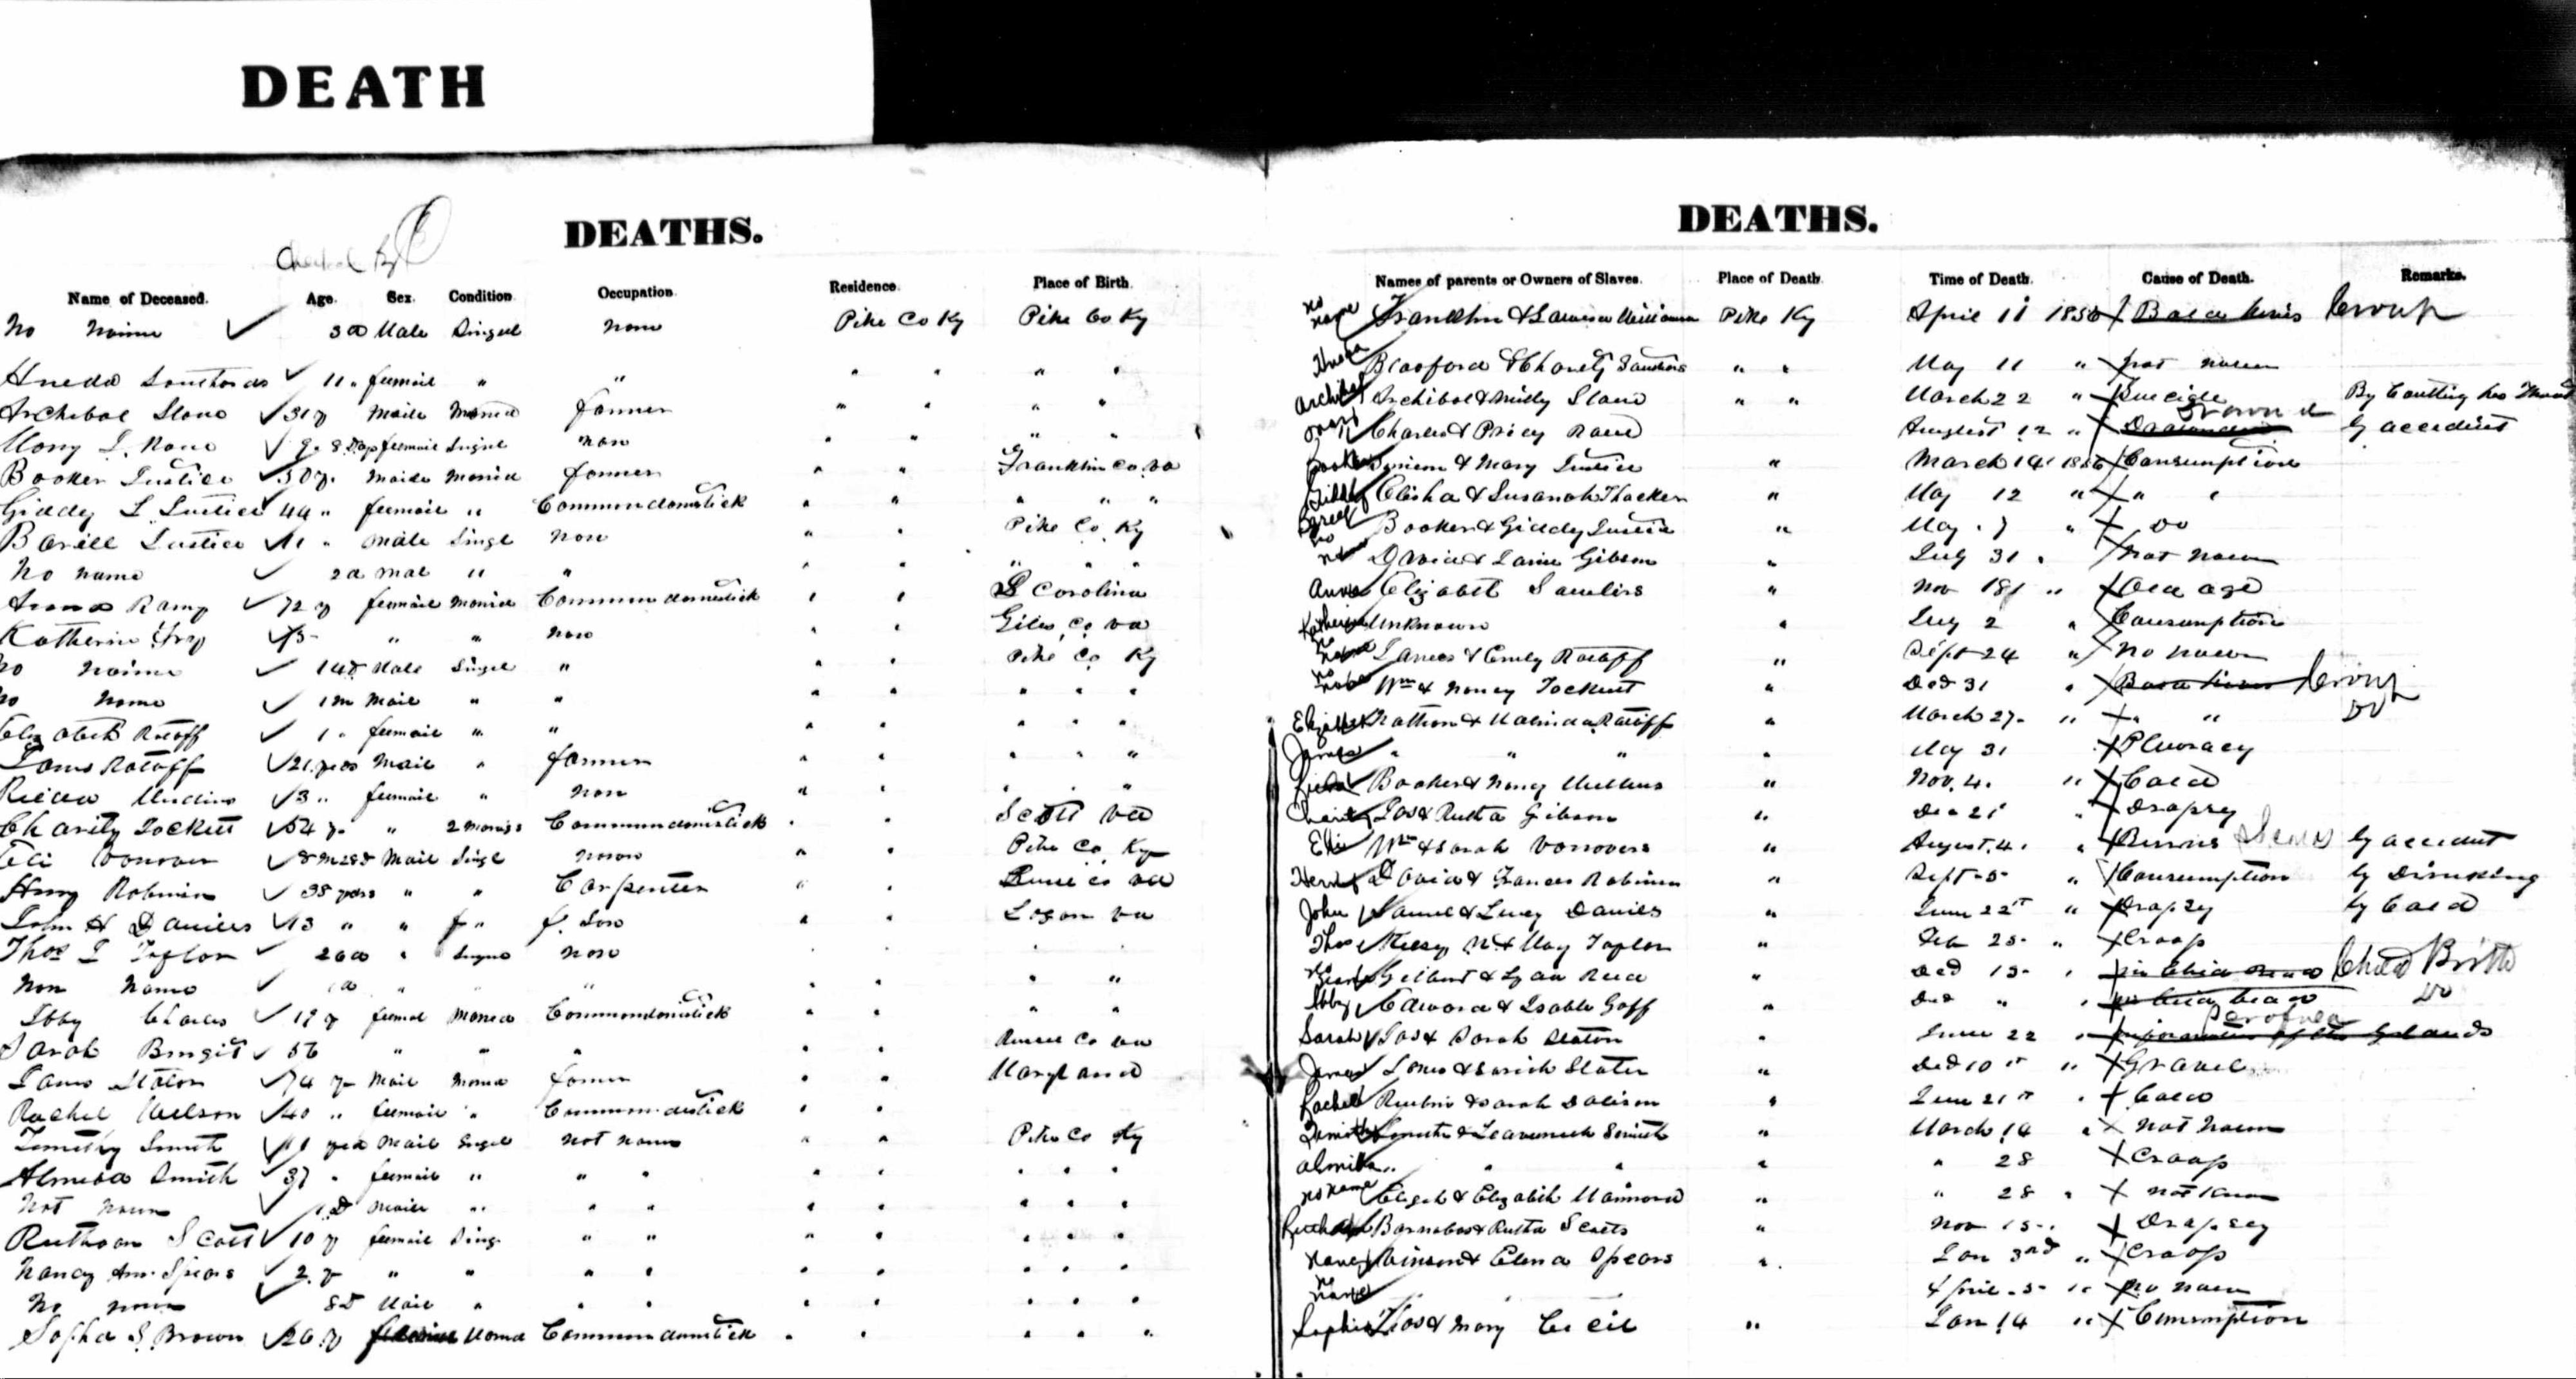 ramey family genealogy research